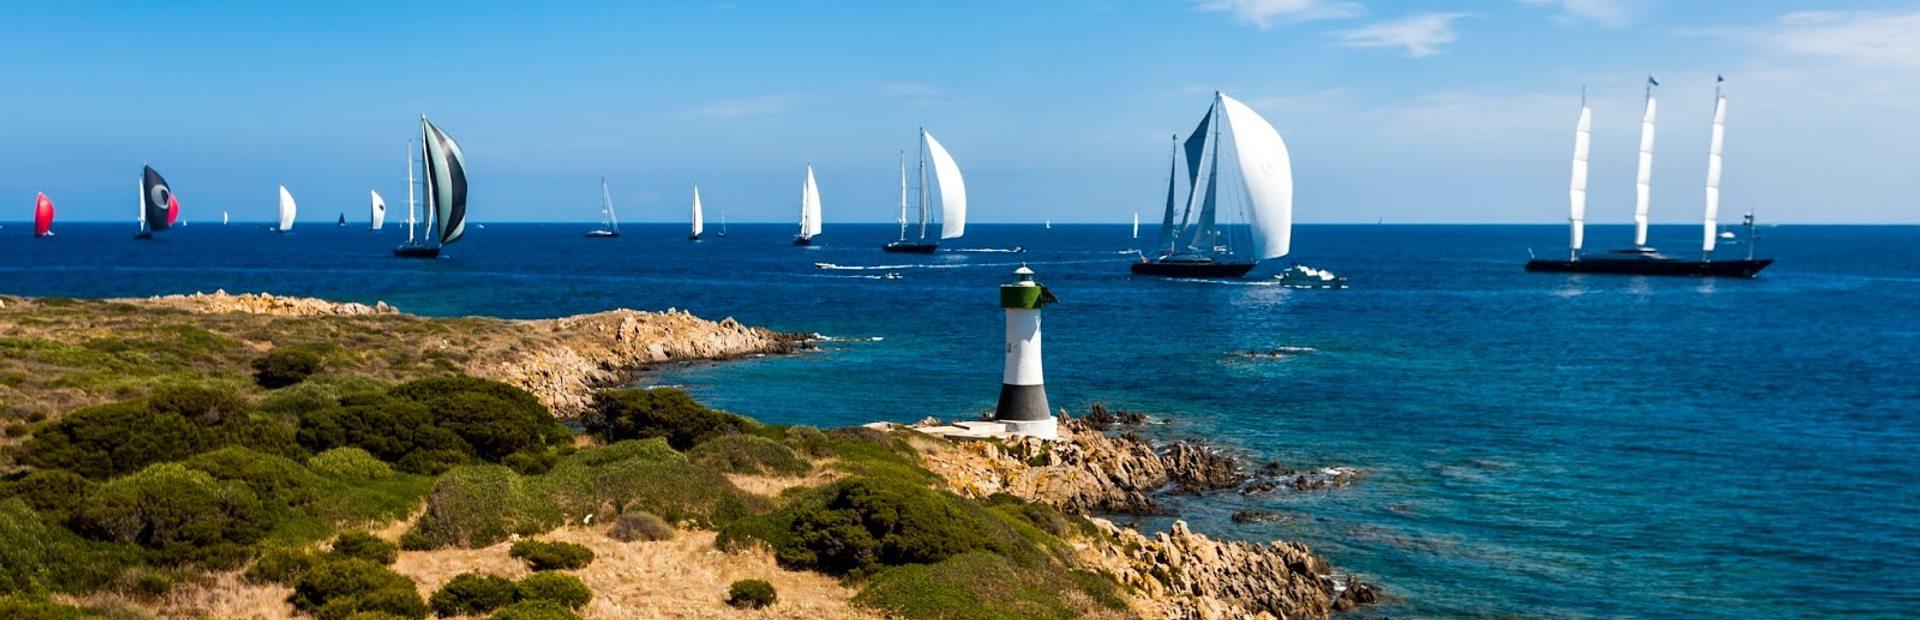 Charter a Perini Navi yacht and race in the next Perini Navi Cup regatta